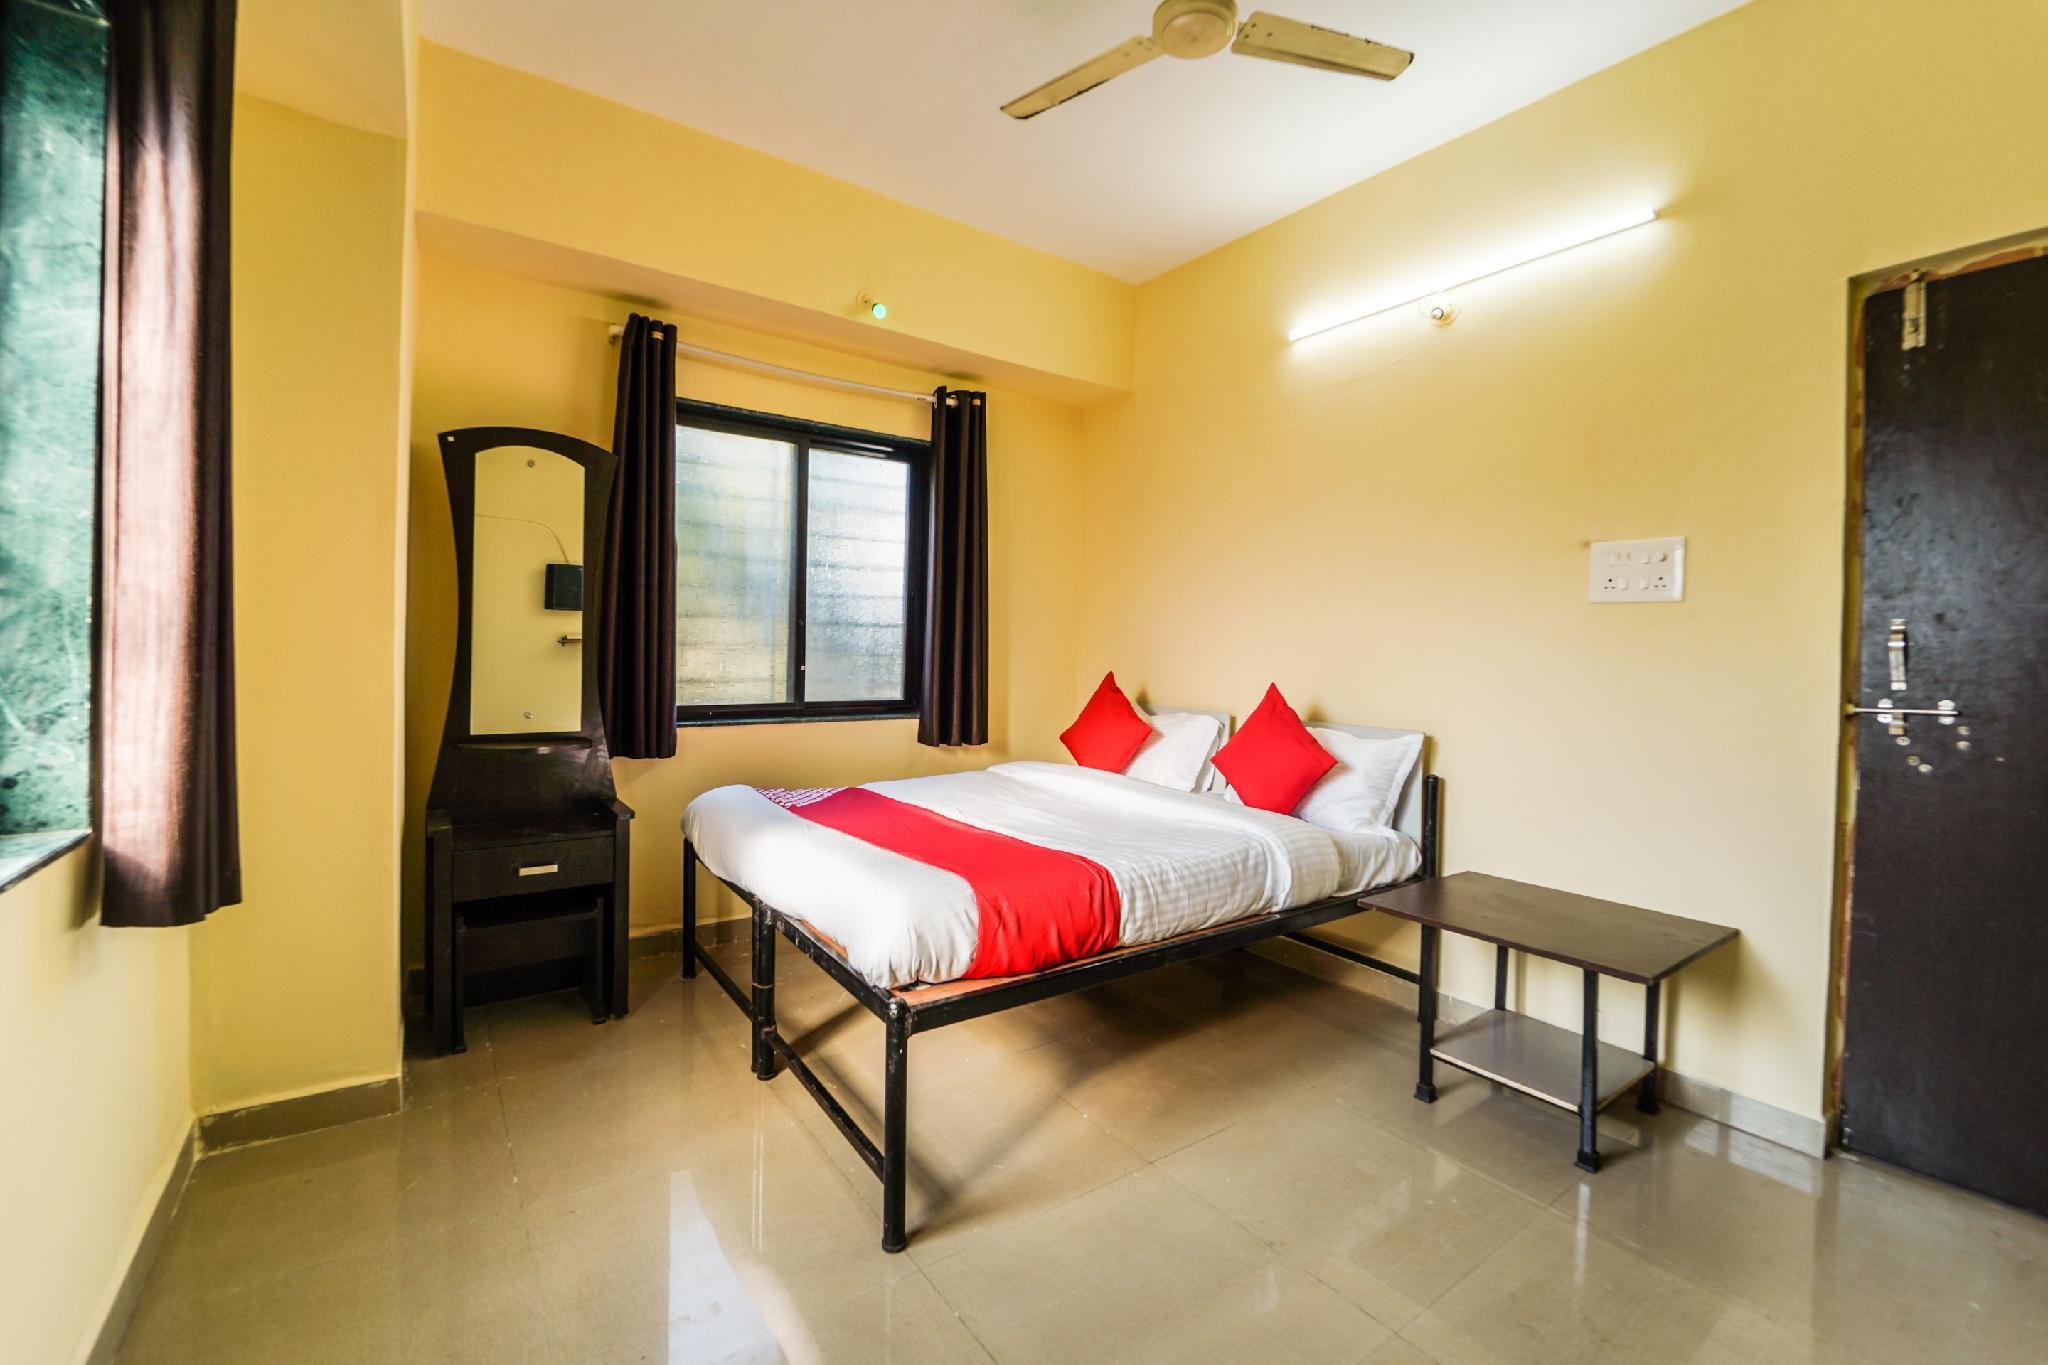 OYO 63440 Hotel Shree Ram